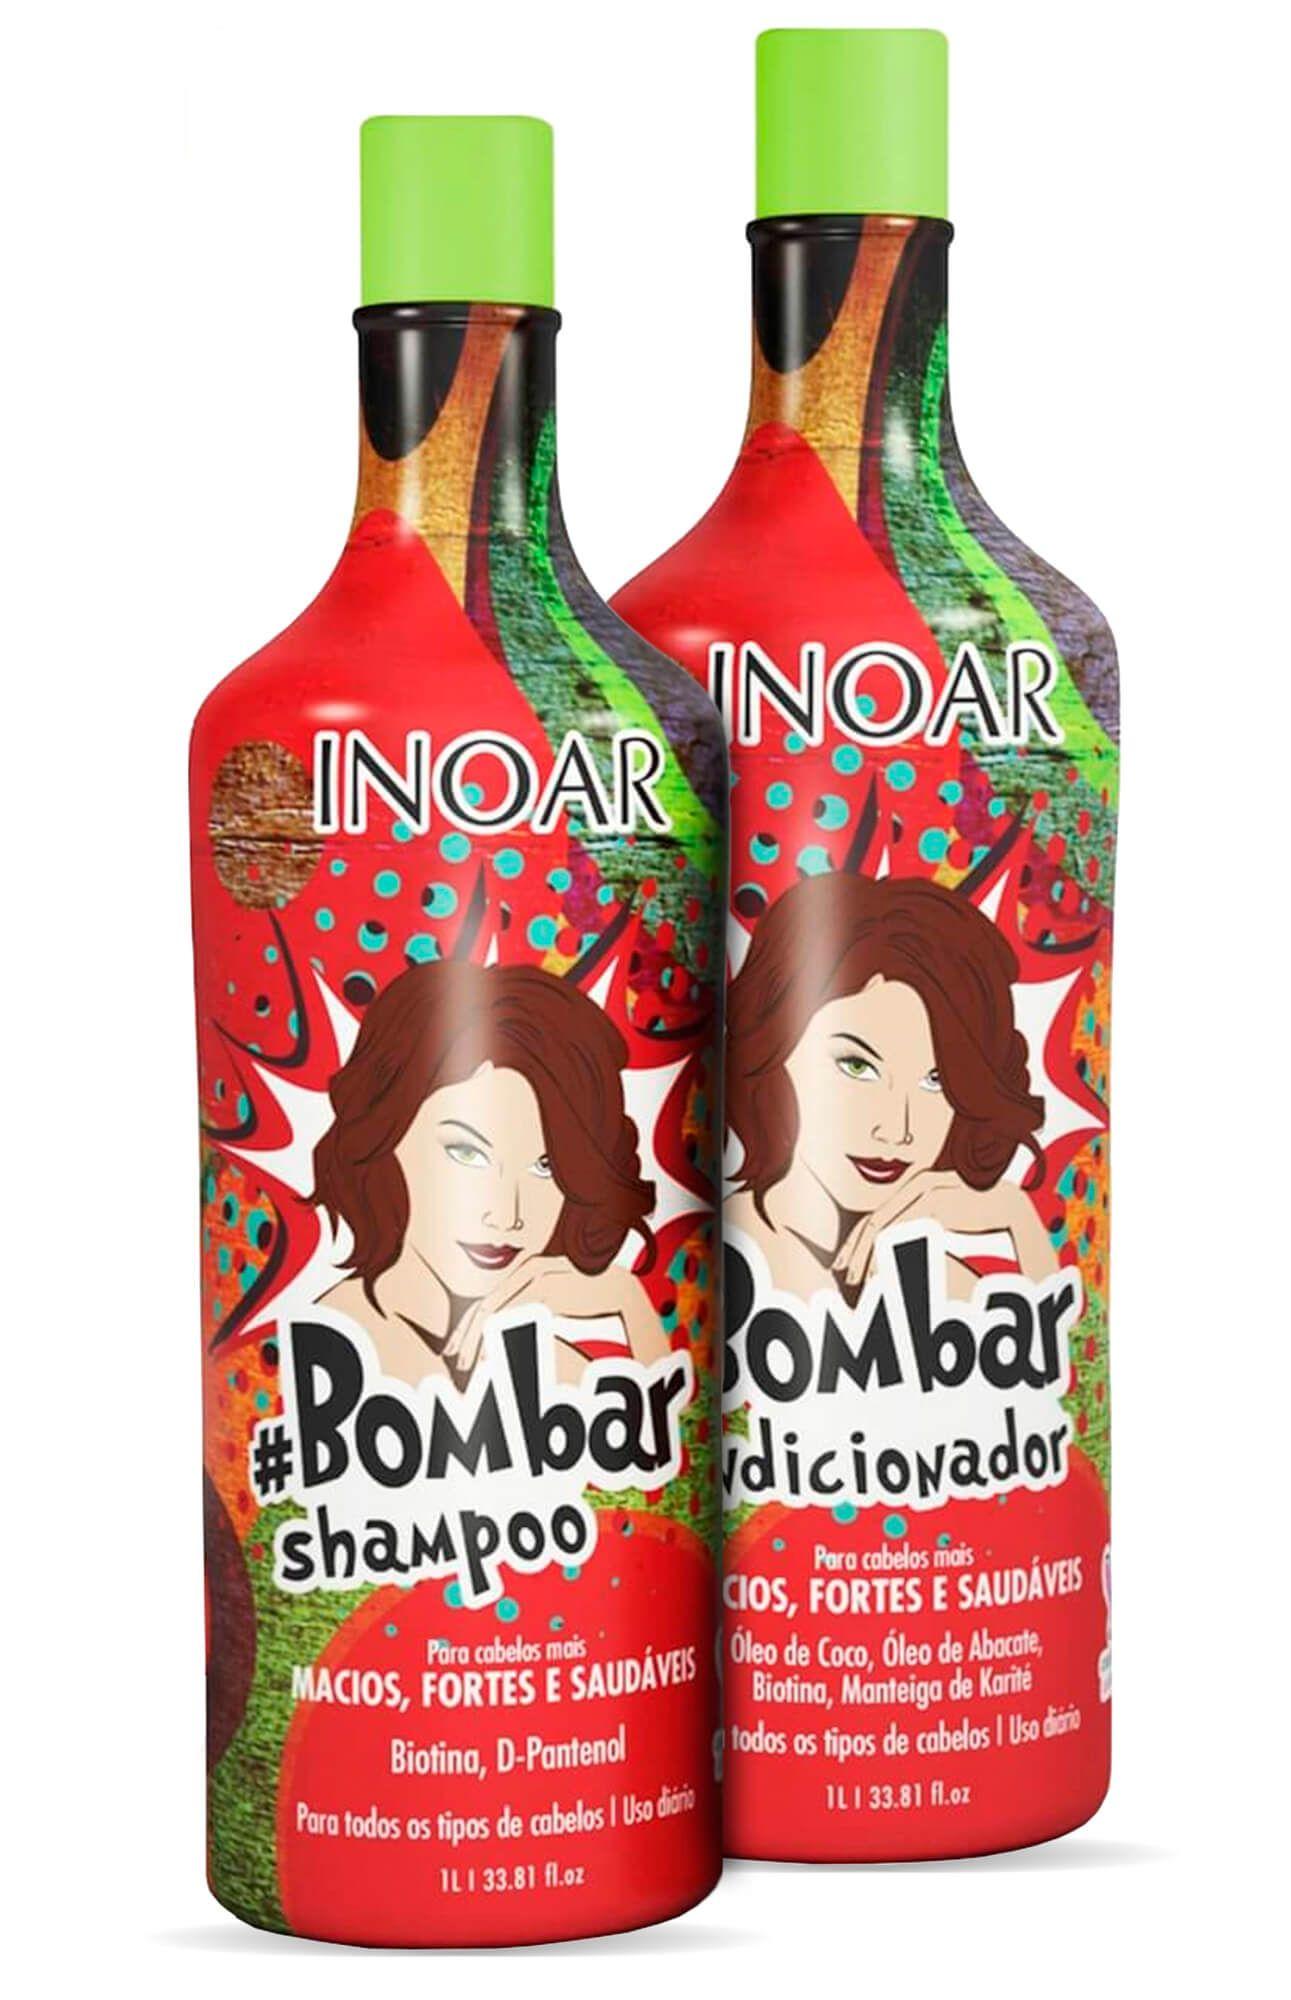 Kit Inoar bombar (shampoo E Condicionador) 1000ml